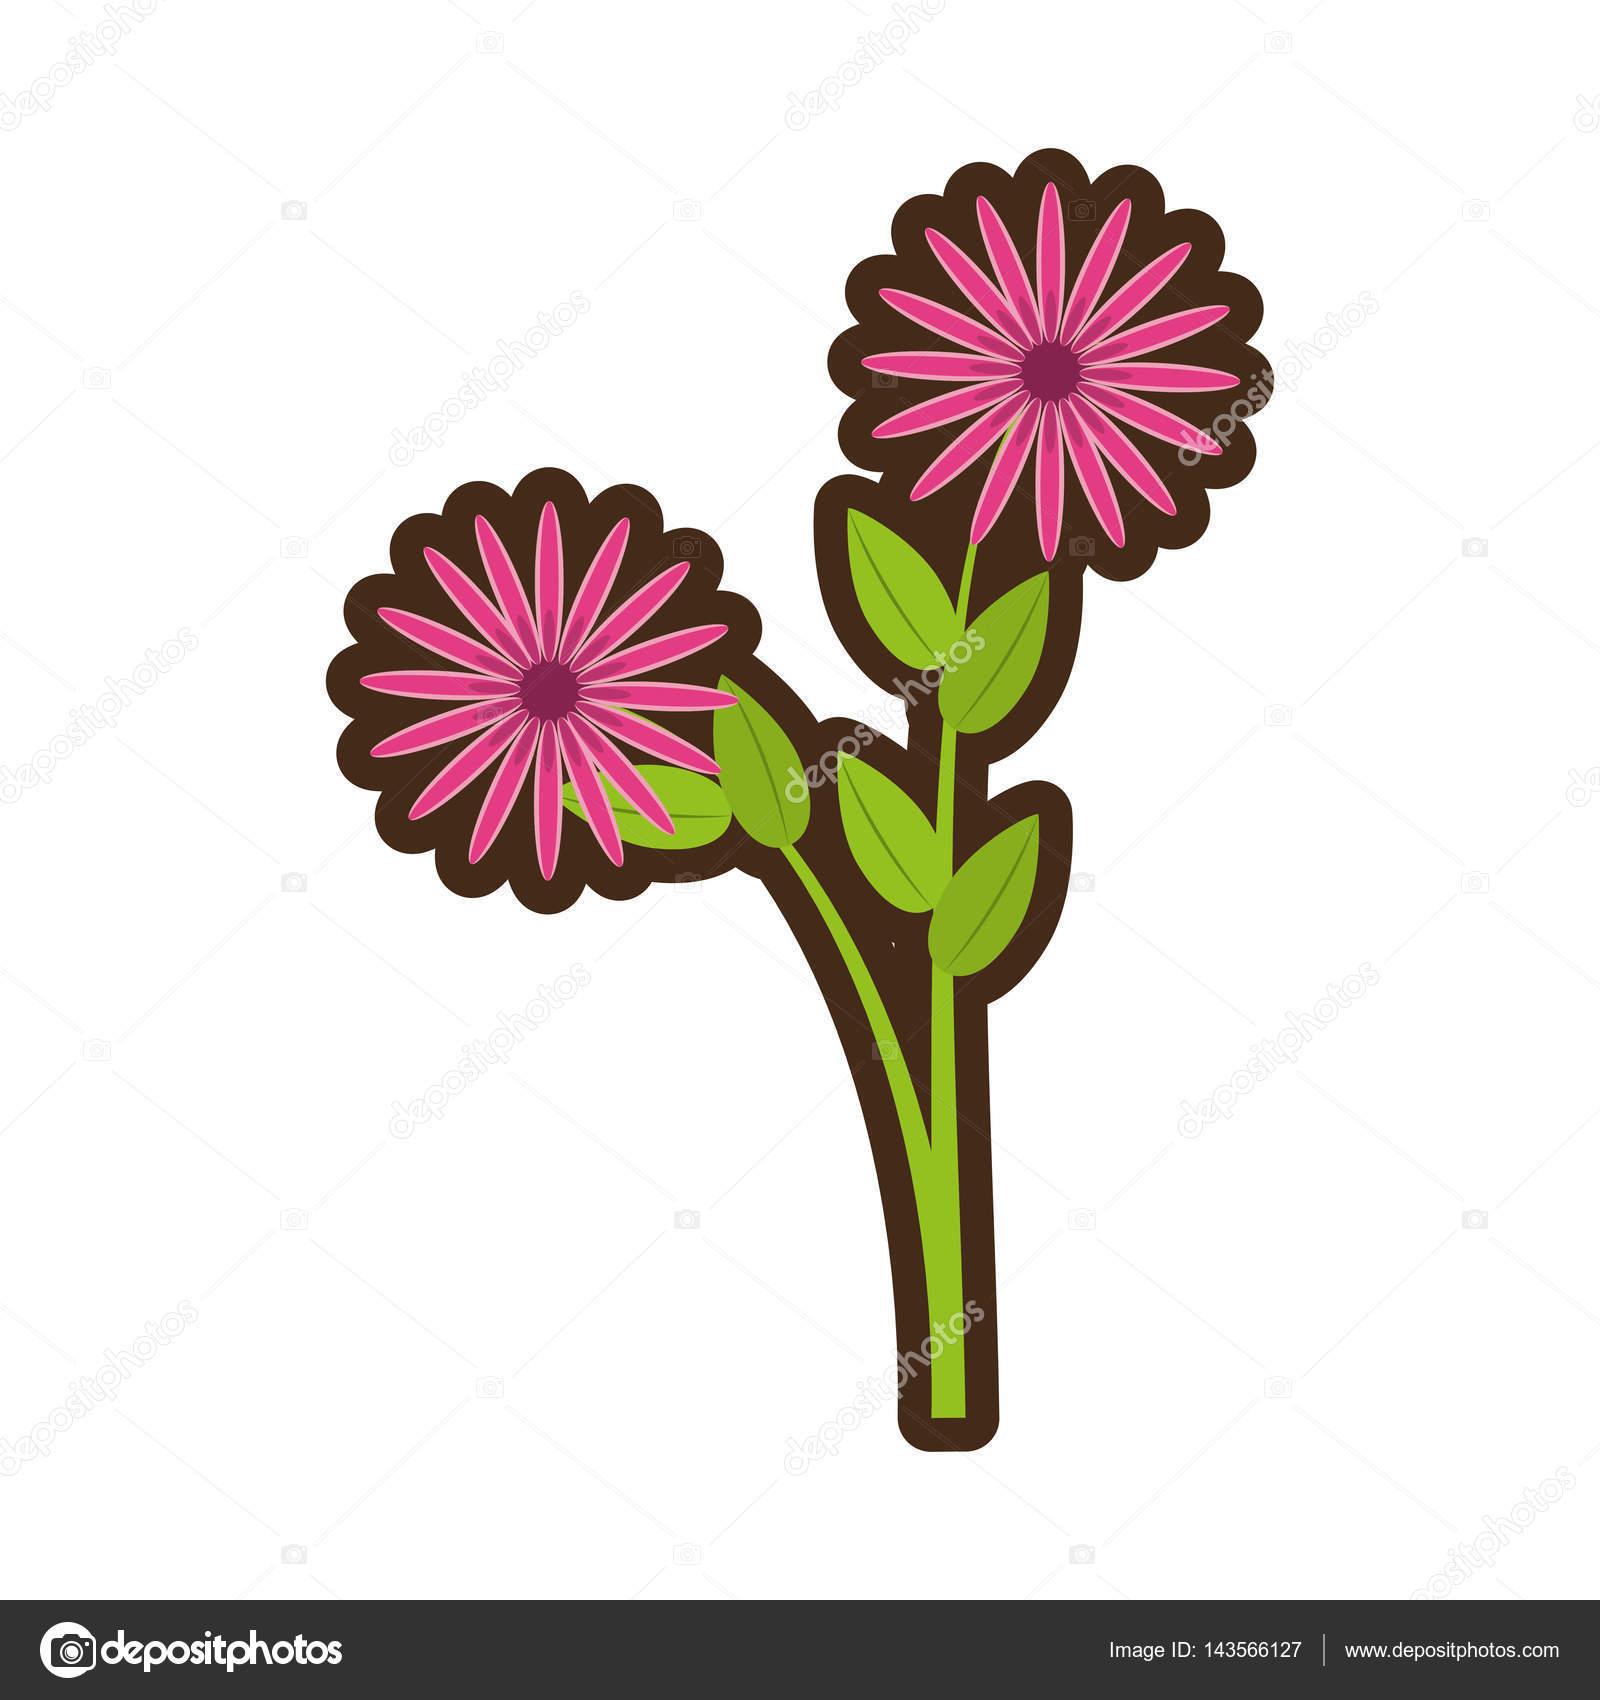 Cartoon daisy flowers bunch flora stock vector djv 143566127 cartoon daisy flowers bunch flora stock vector izmirmasajfo